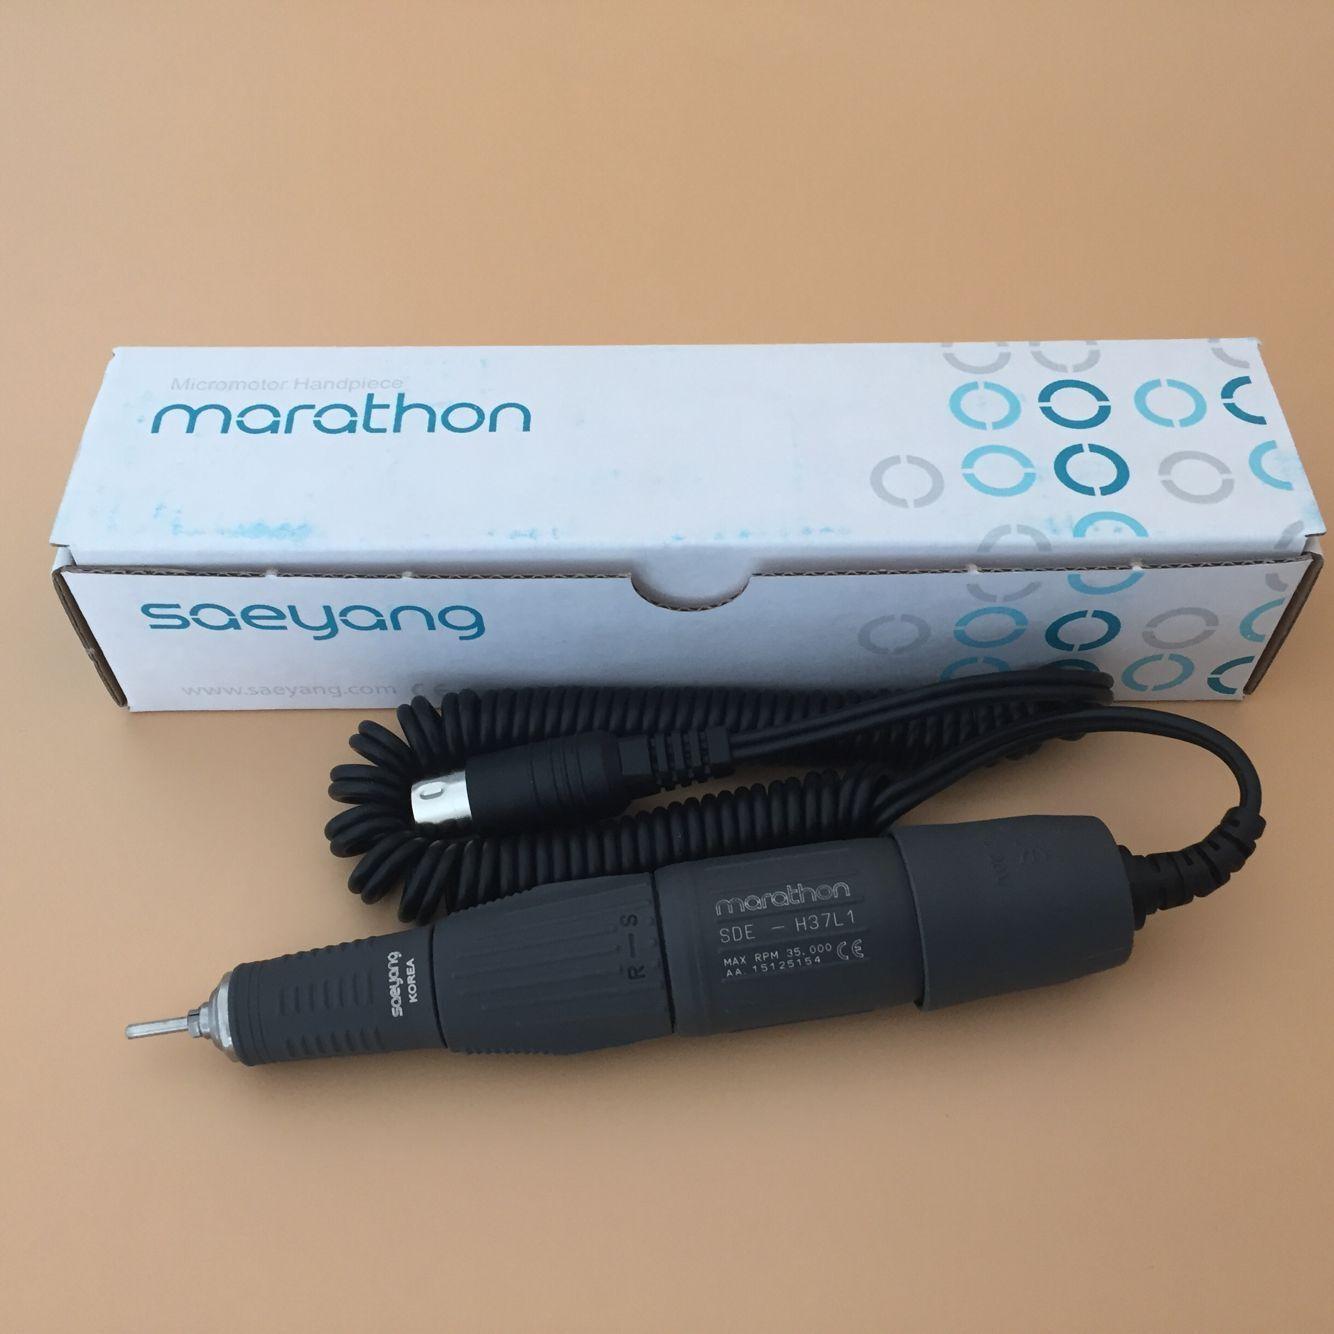 Dental Marathon Lab Electric Micro motor Motor Handpiece for Polishing 35K RPM H37L1 Series Micromotor